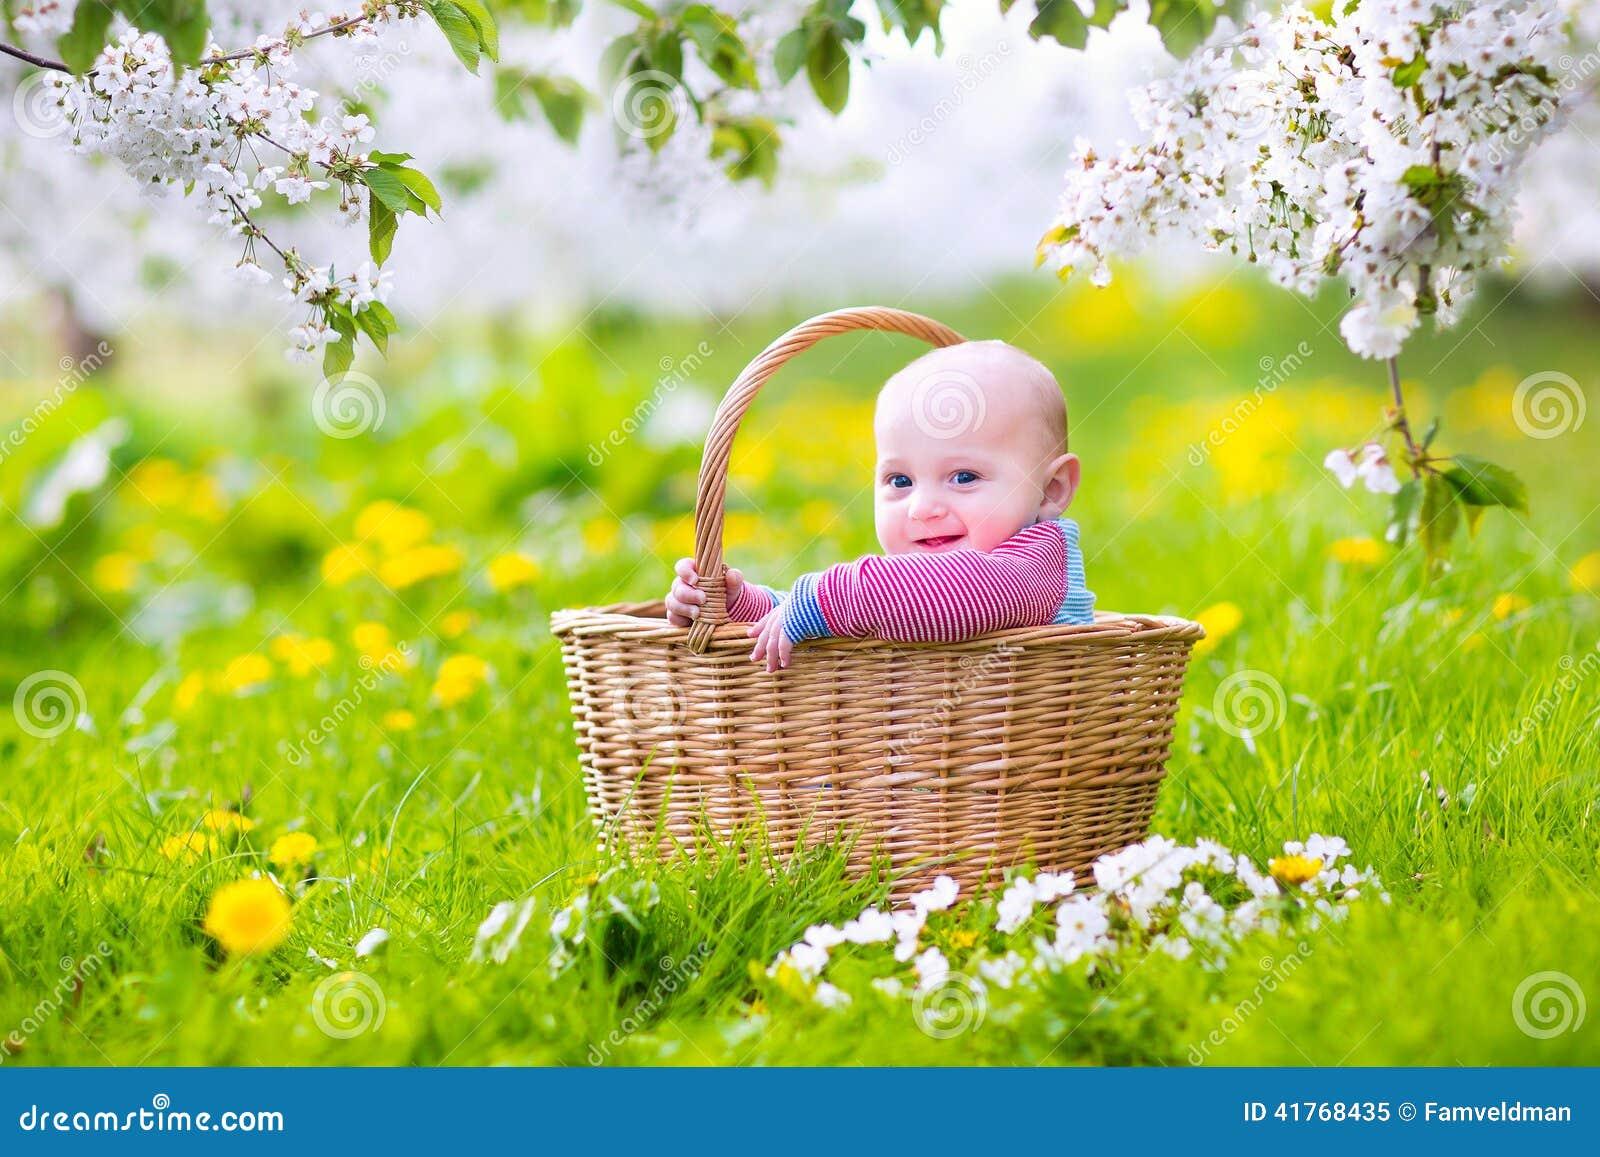 sweet baby in basket in blooming apple tree garden stock